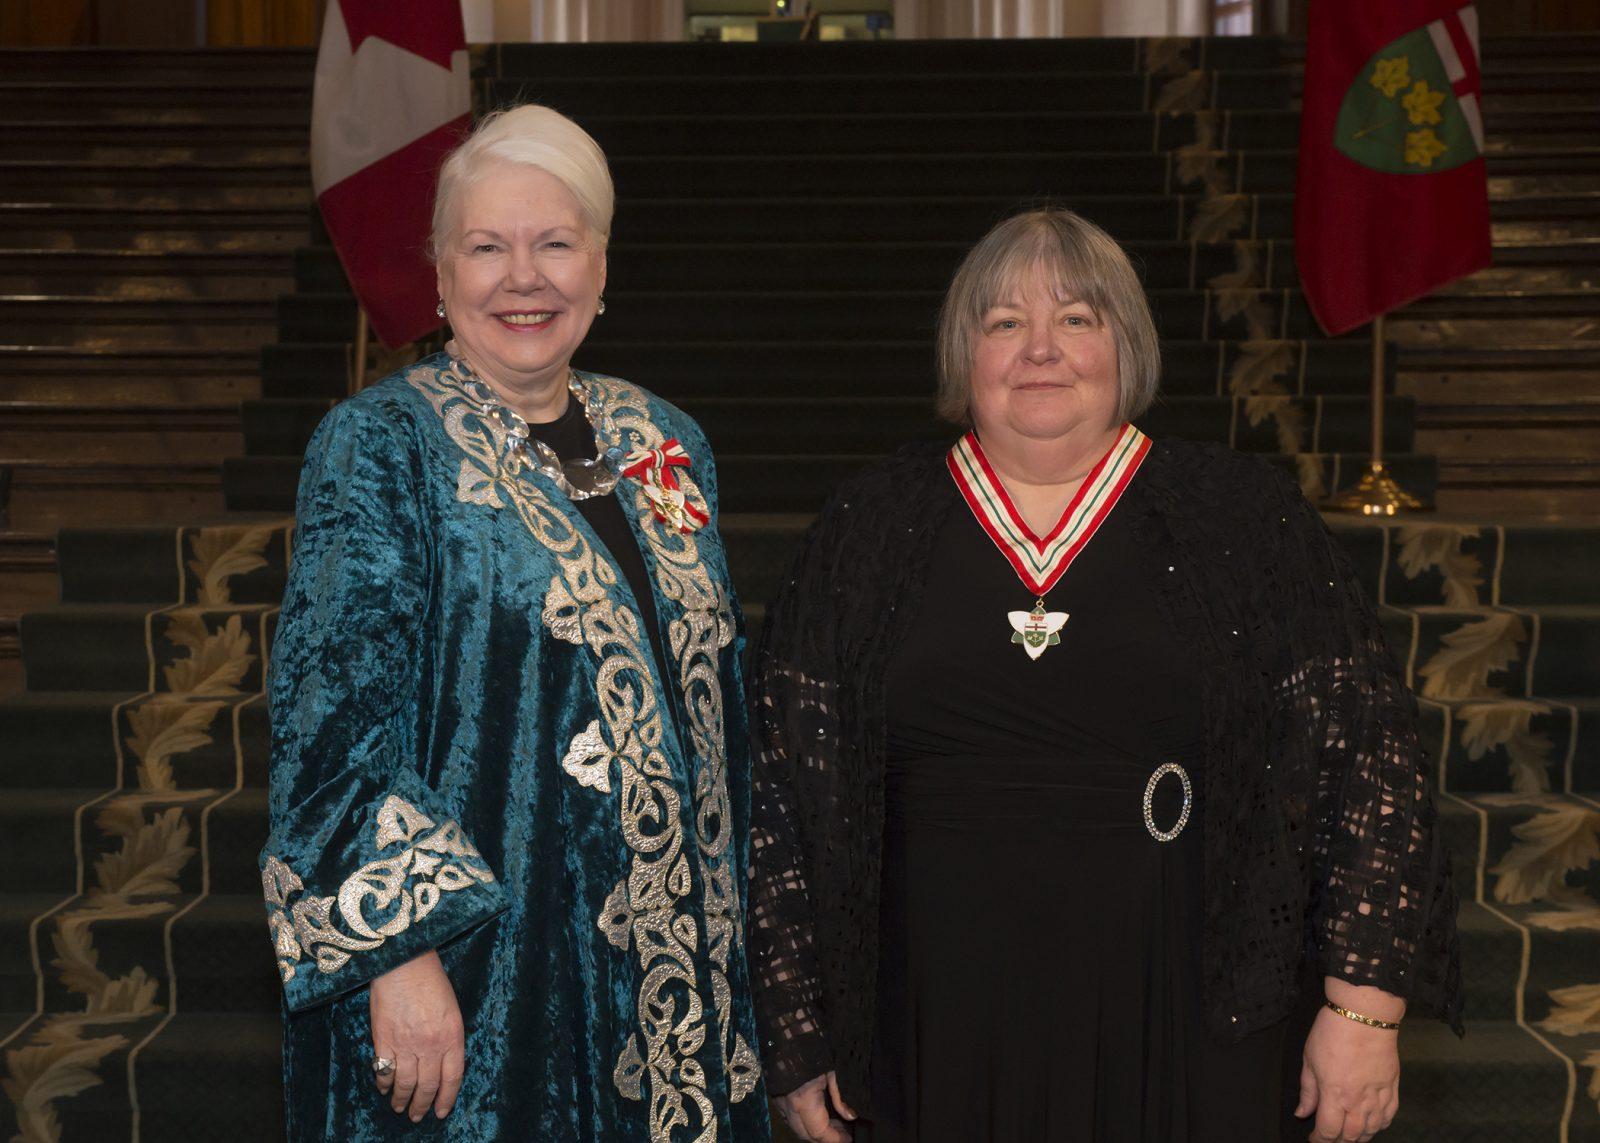 Célébrer les histoires des Ontariens : Alis B. Kennedy, Membre de l'Ordre de l'Ontario